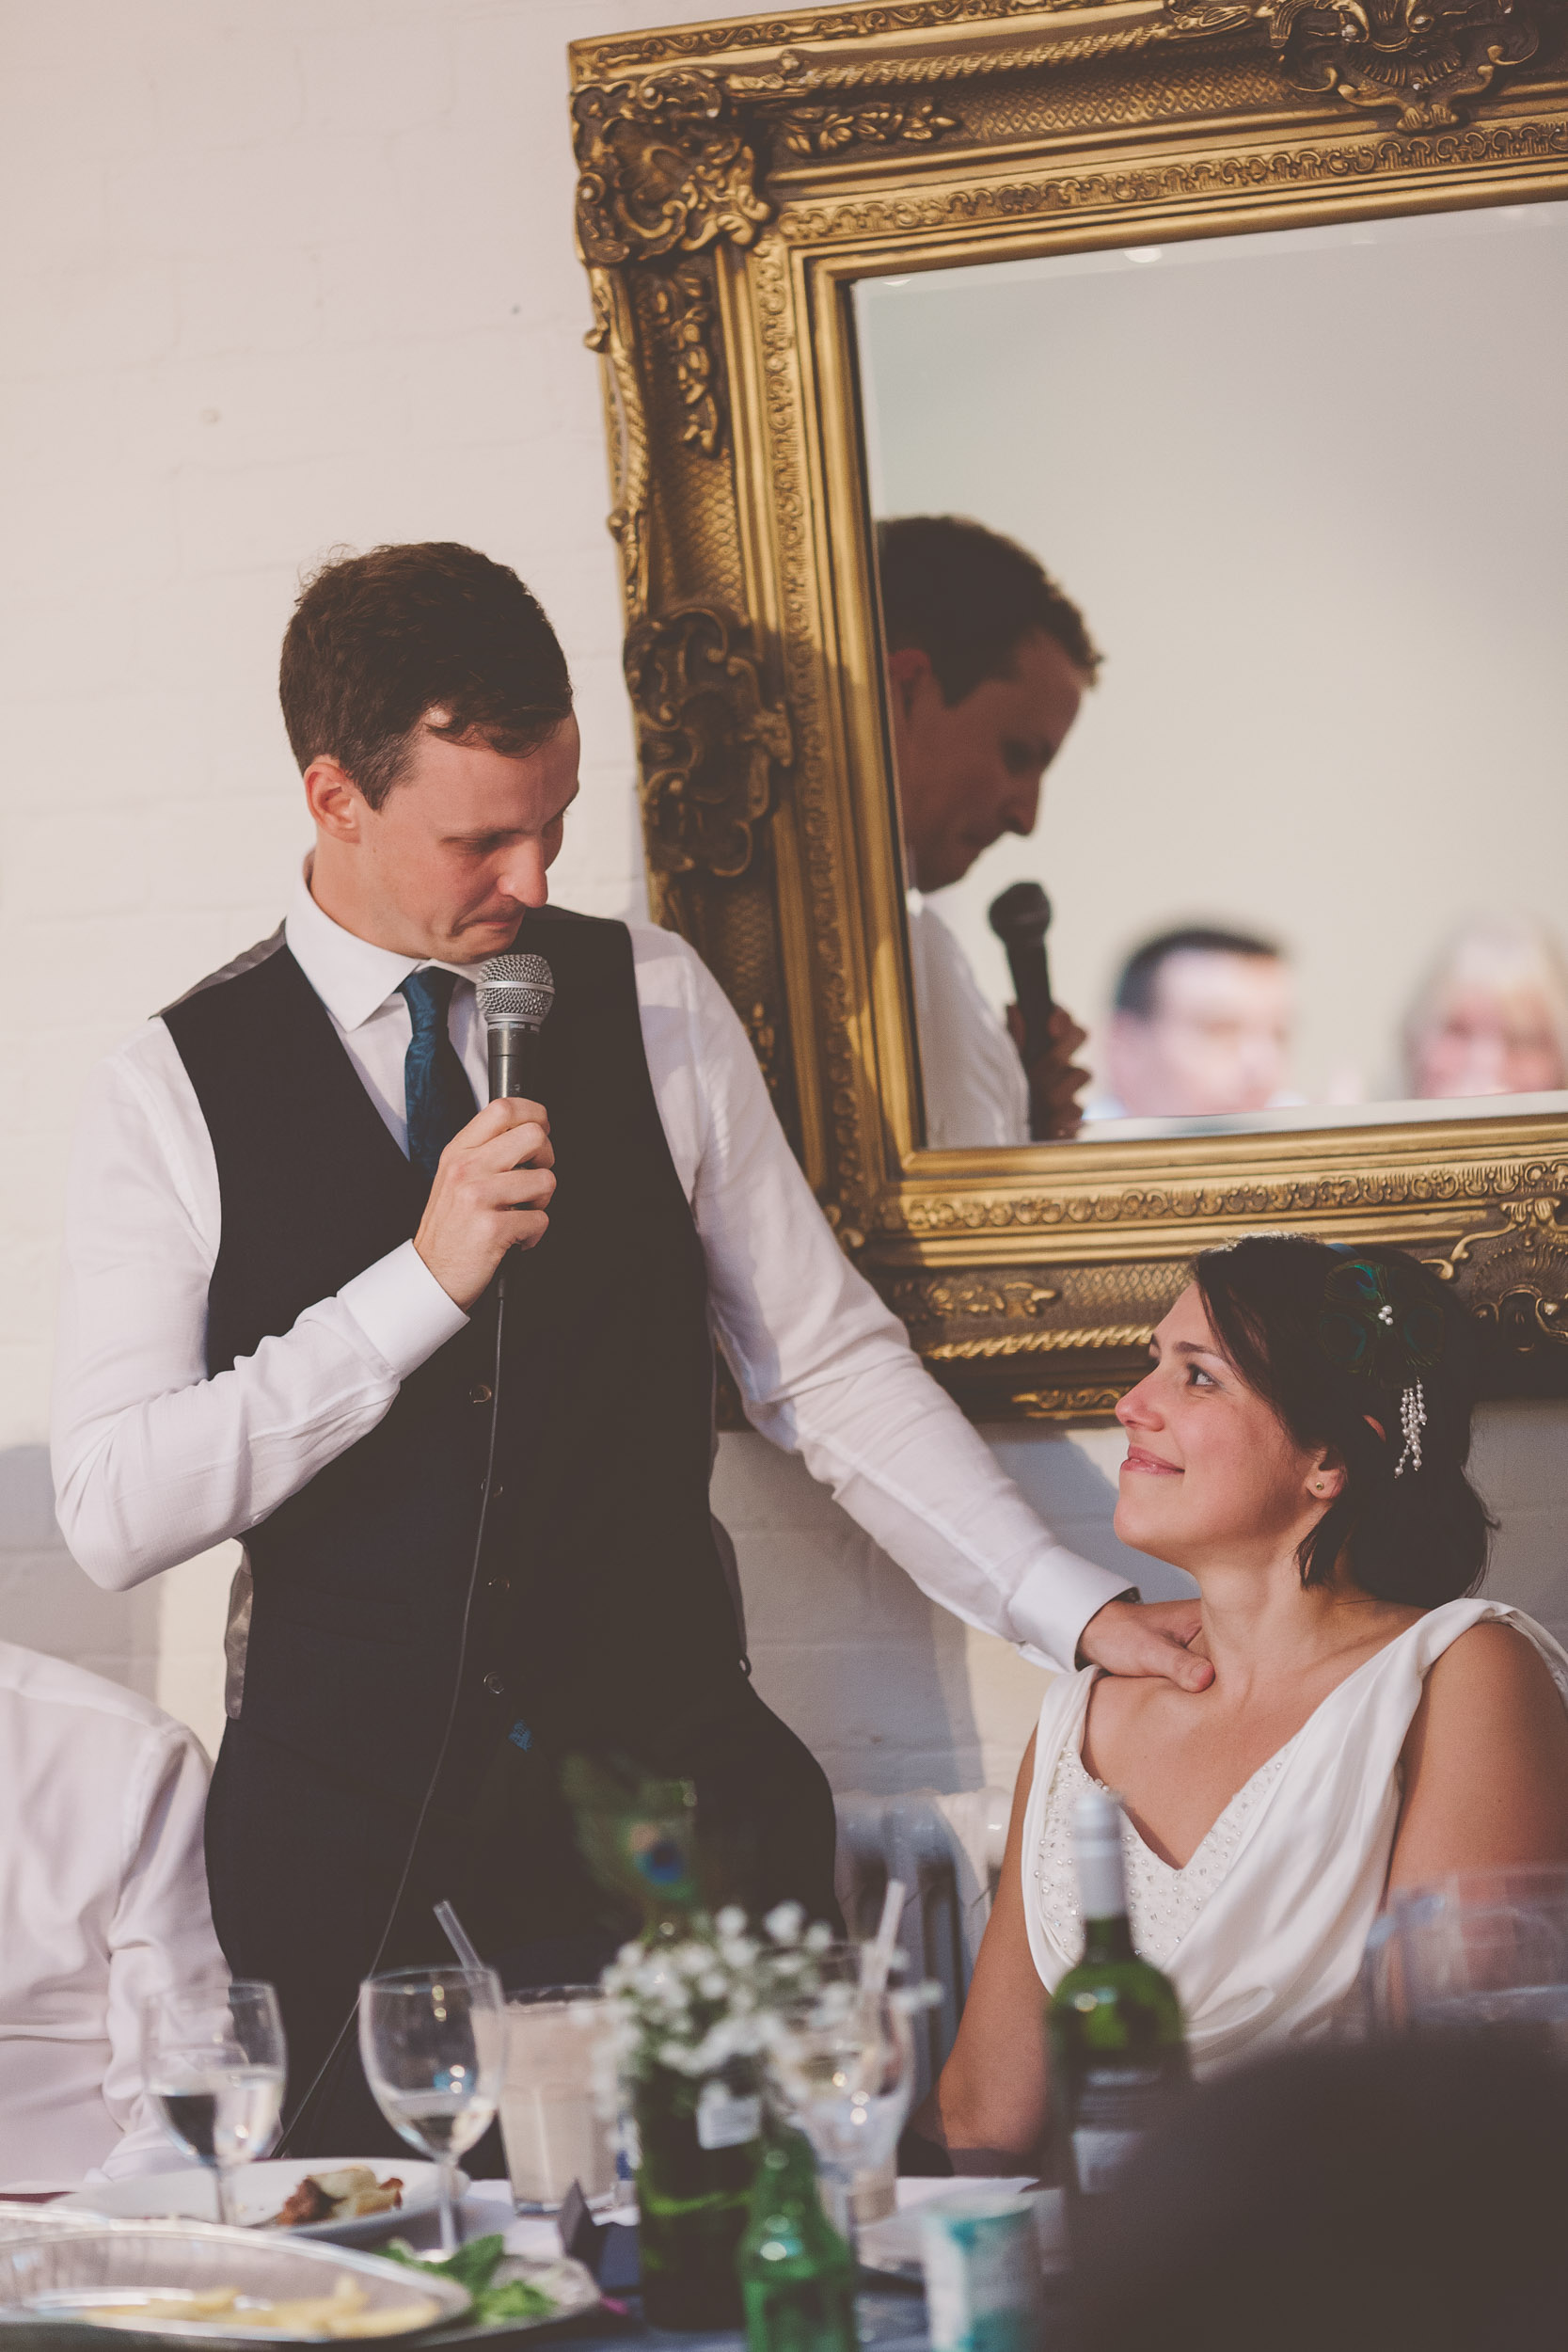 islington-town-hall-4th-floor-studios-wedding380.jpg